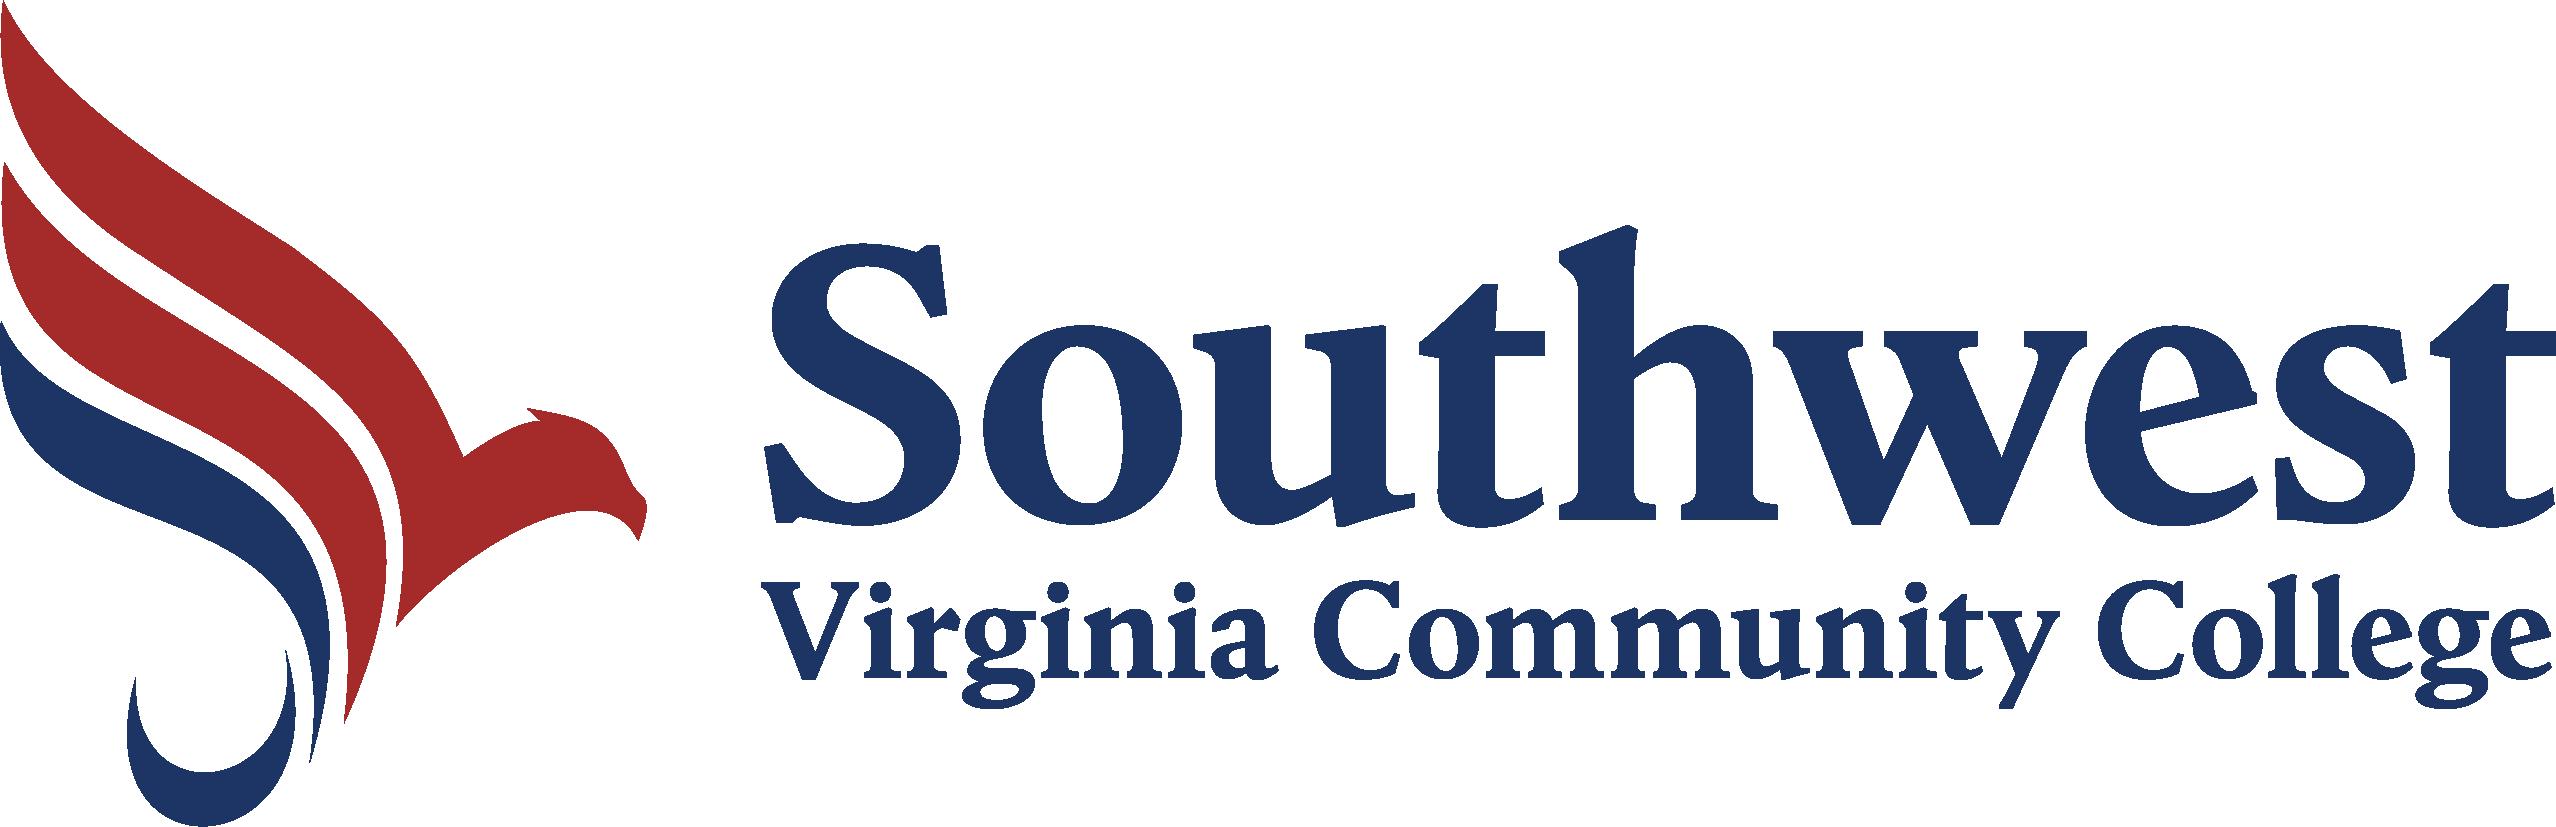 Southwest Virginia Community College